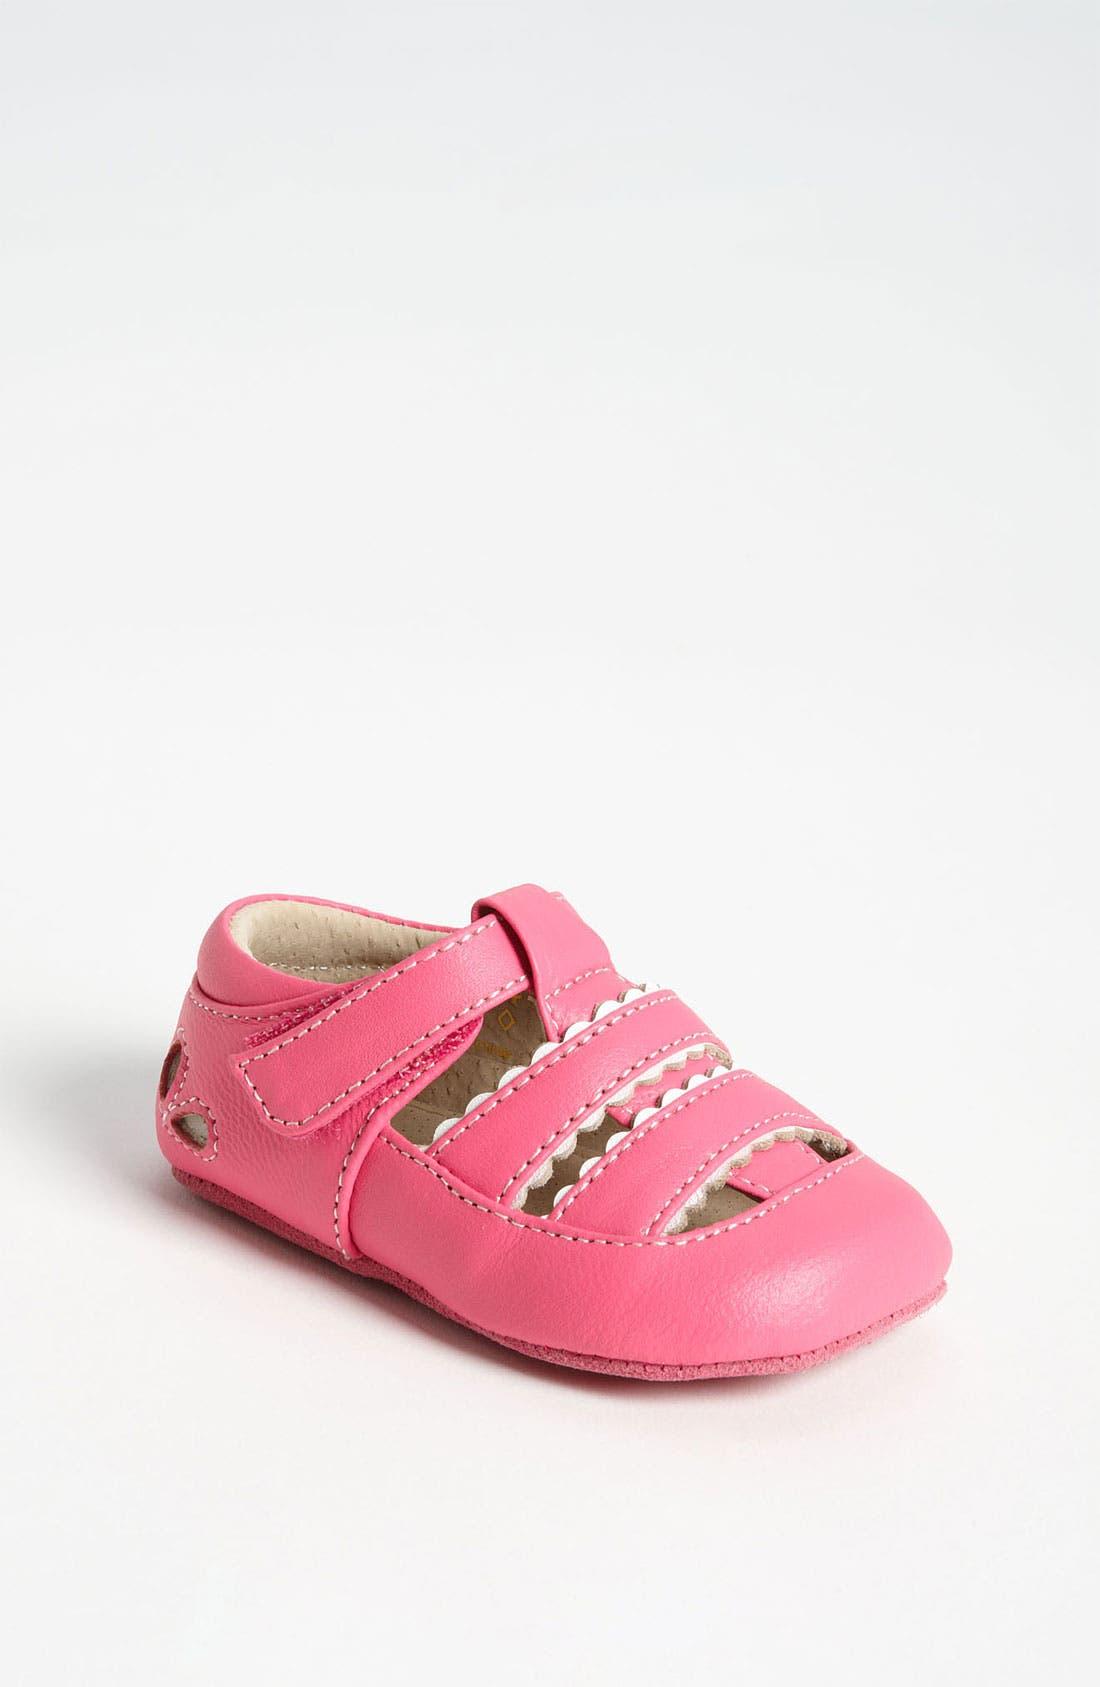 Main Image - See Kai Run 'Brook' Sandal (Baby & Walker)